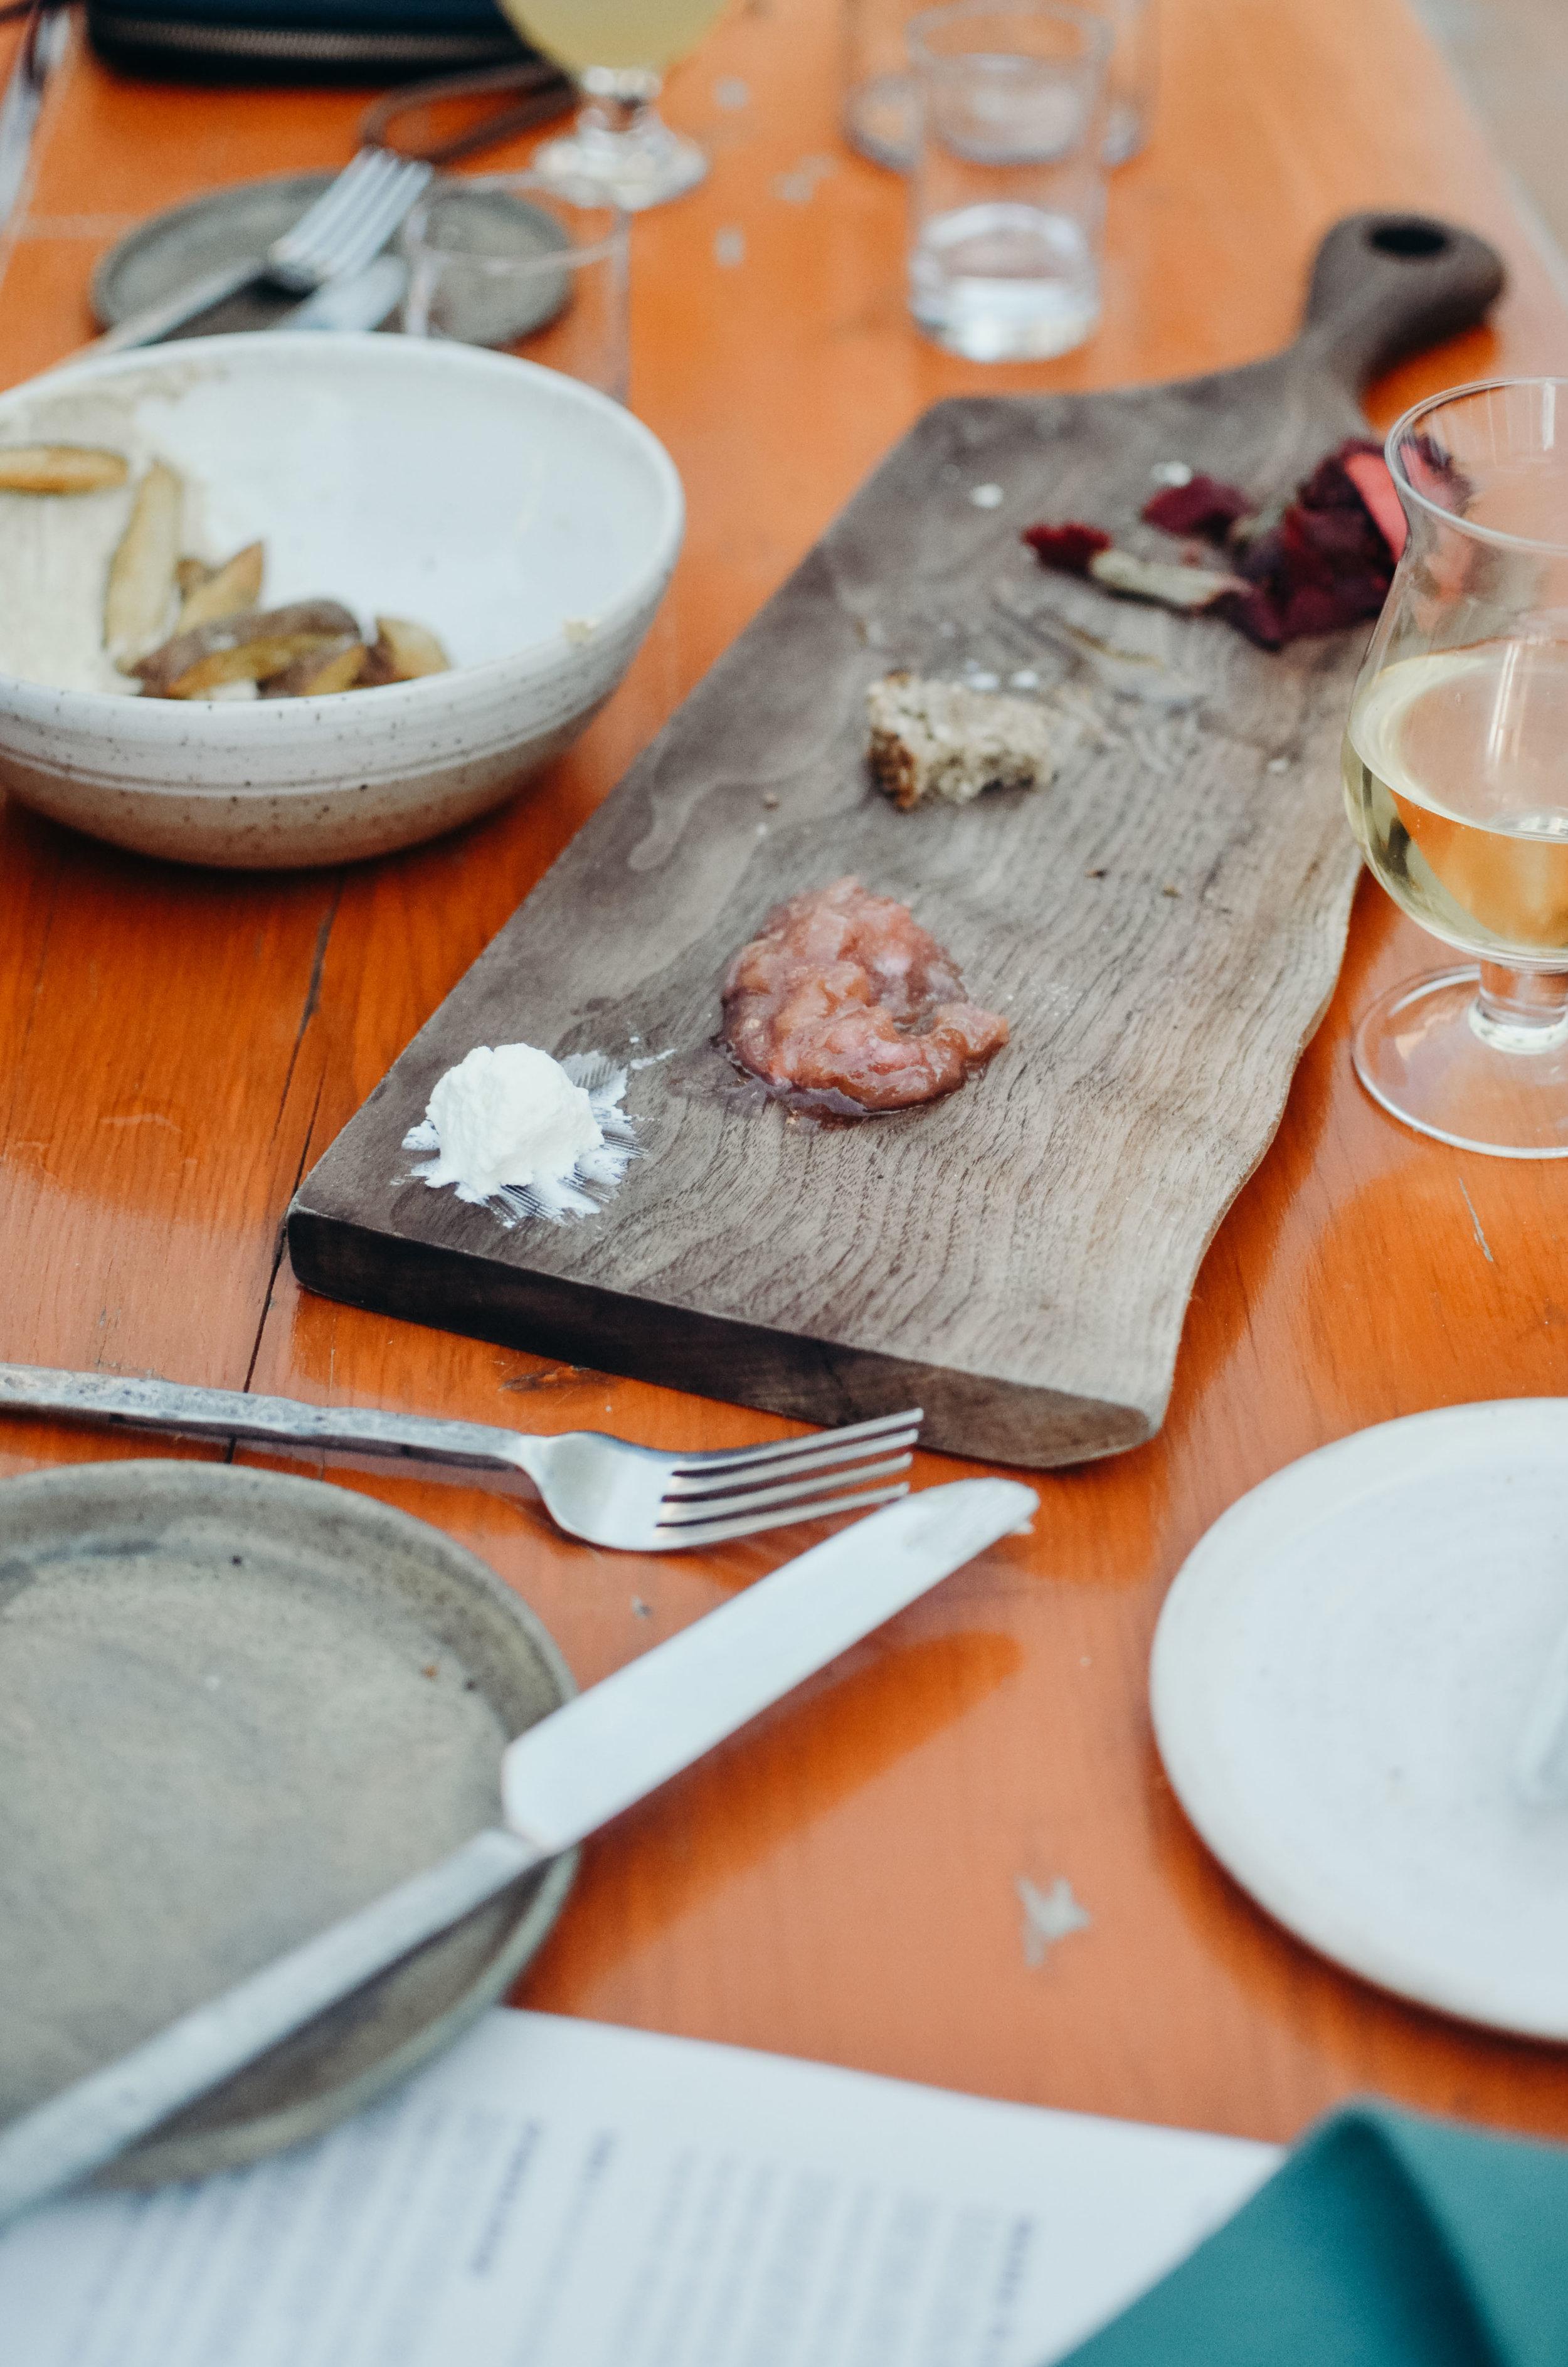 Wendling_Boyd_The_Sovengard_Dinner_With_Loved_Ones-4.jpg